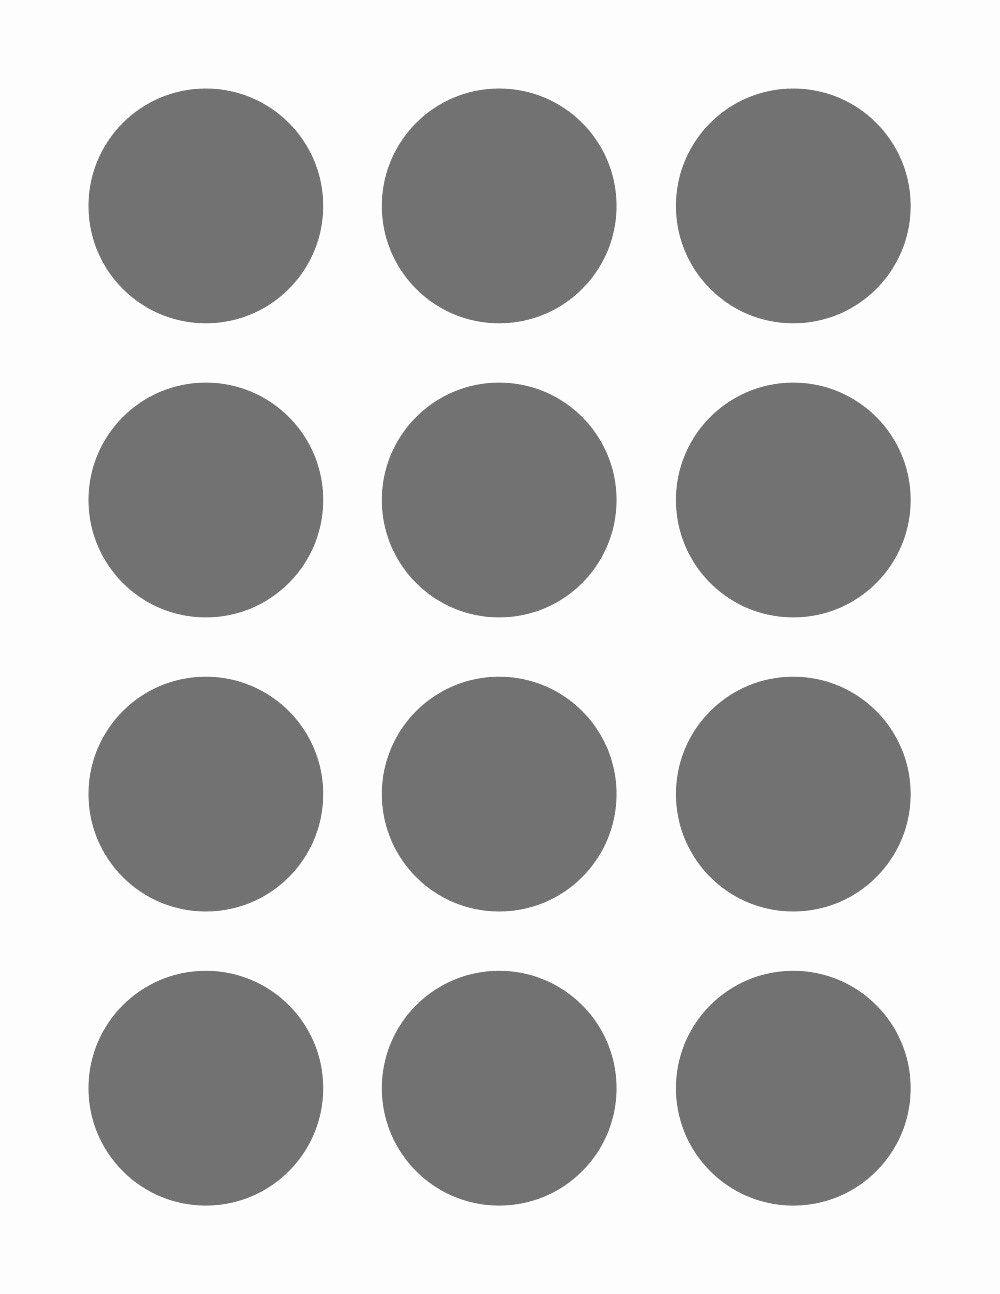 3 Inch Diameter Circle Template Elegant Psd Template 12 Circles 2 Inch Diameter